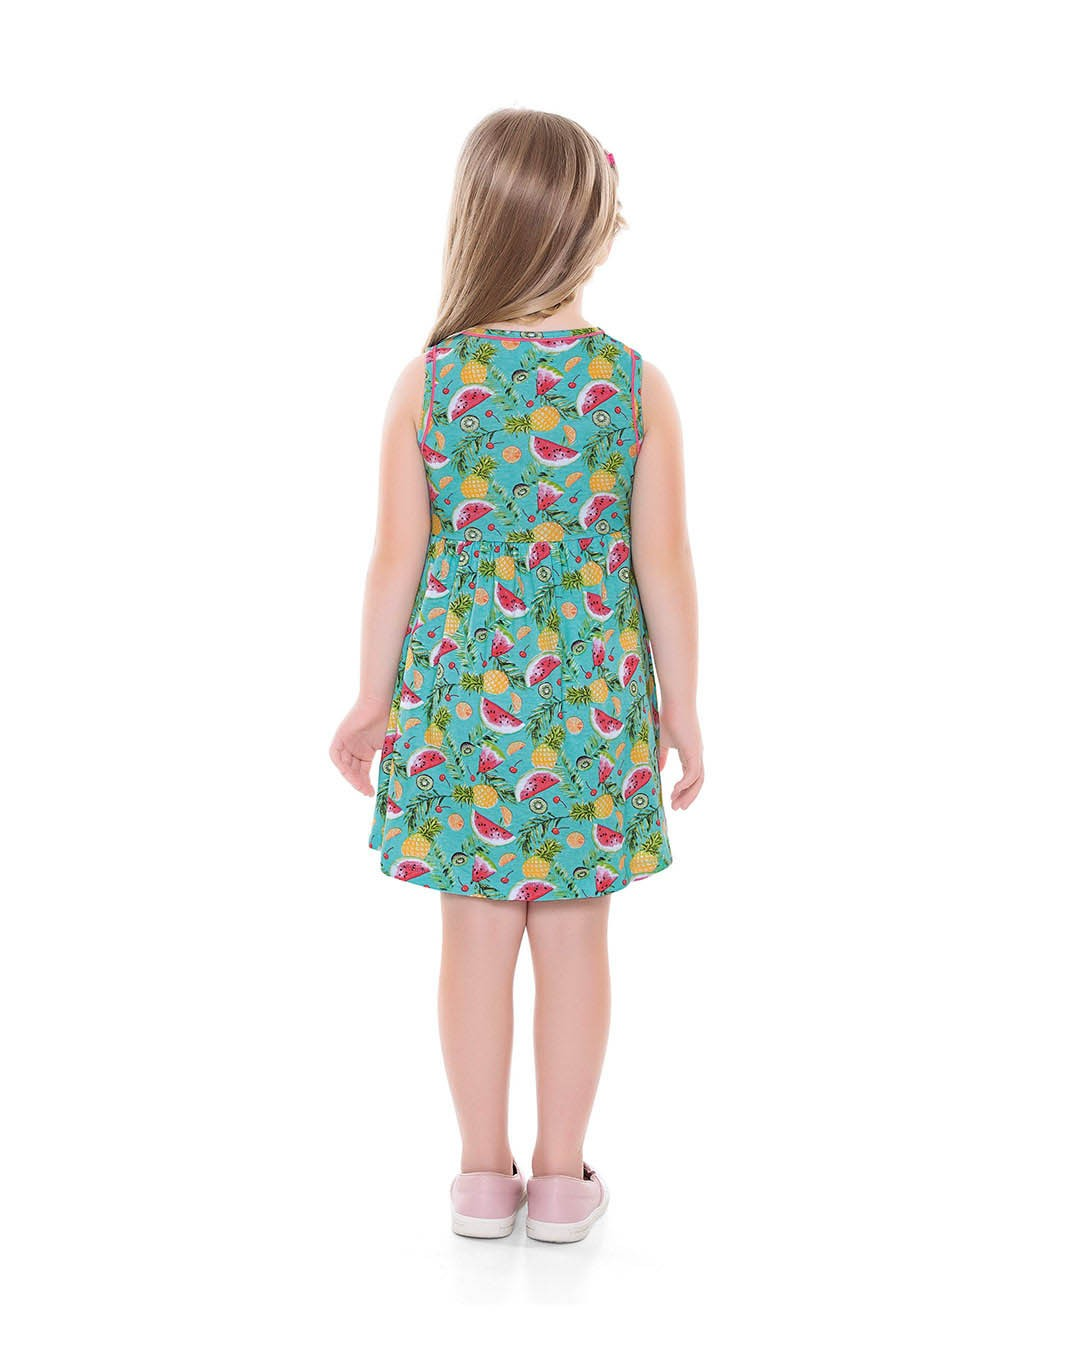 Vestido Infantil Melancias Verde - For Fun